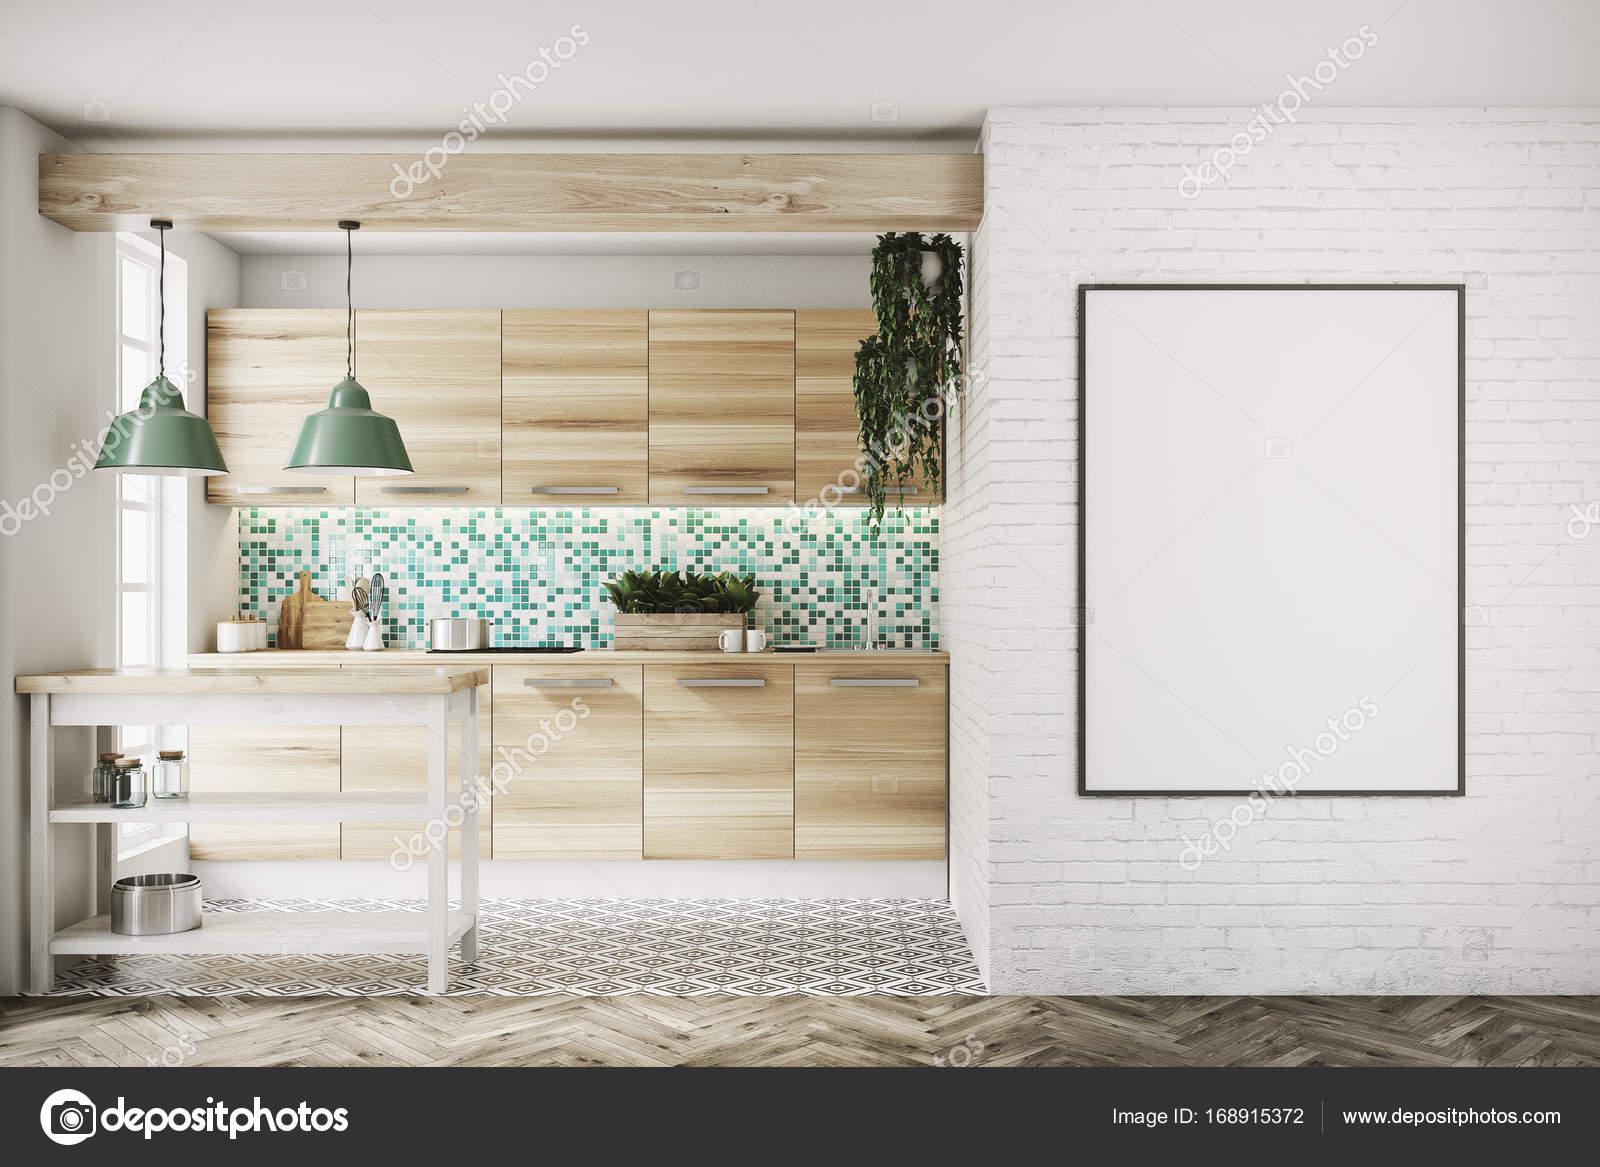 kitchen console table metal canisters 绿色马赛克厨房 木控制台 海报 图库照片 c denisismagilov 168915372 高档厨房内部与绿色和白色拼接墙 大窗户 有趣的地板图案和木制控制台和表 装裱的海报 3d 渲染小样 照片作者denisismagilov